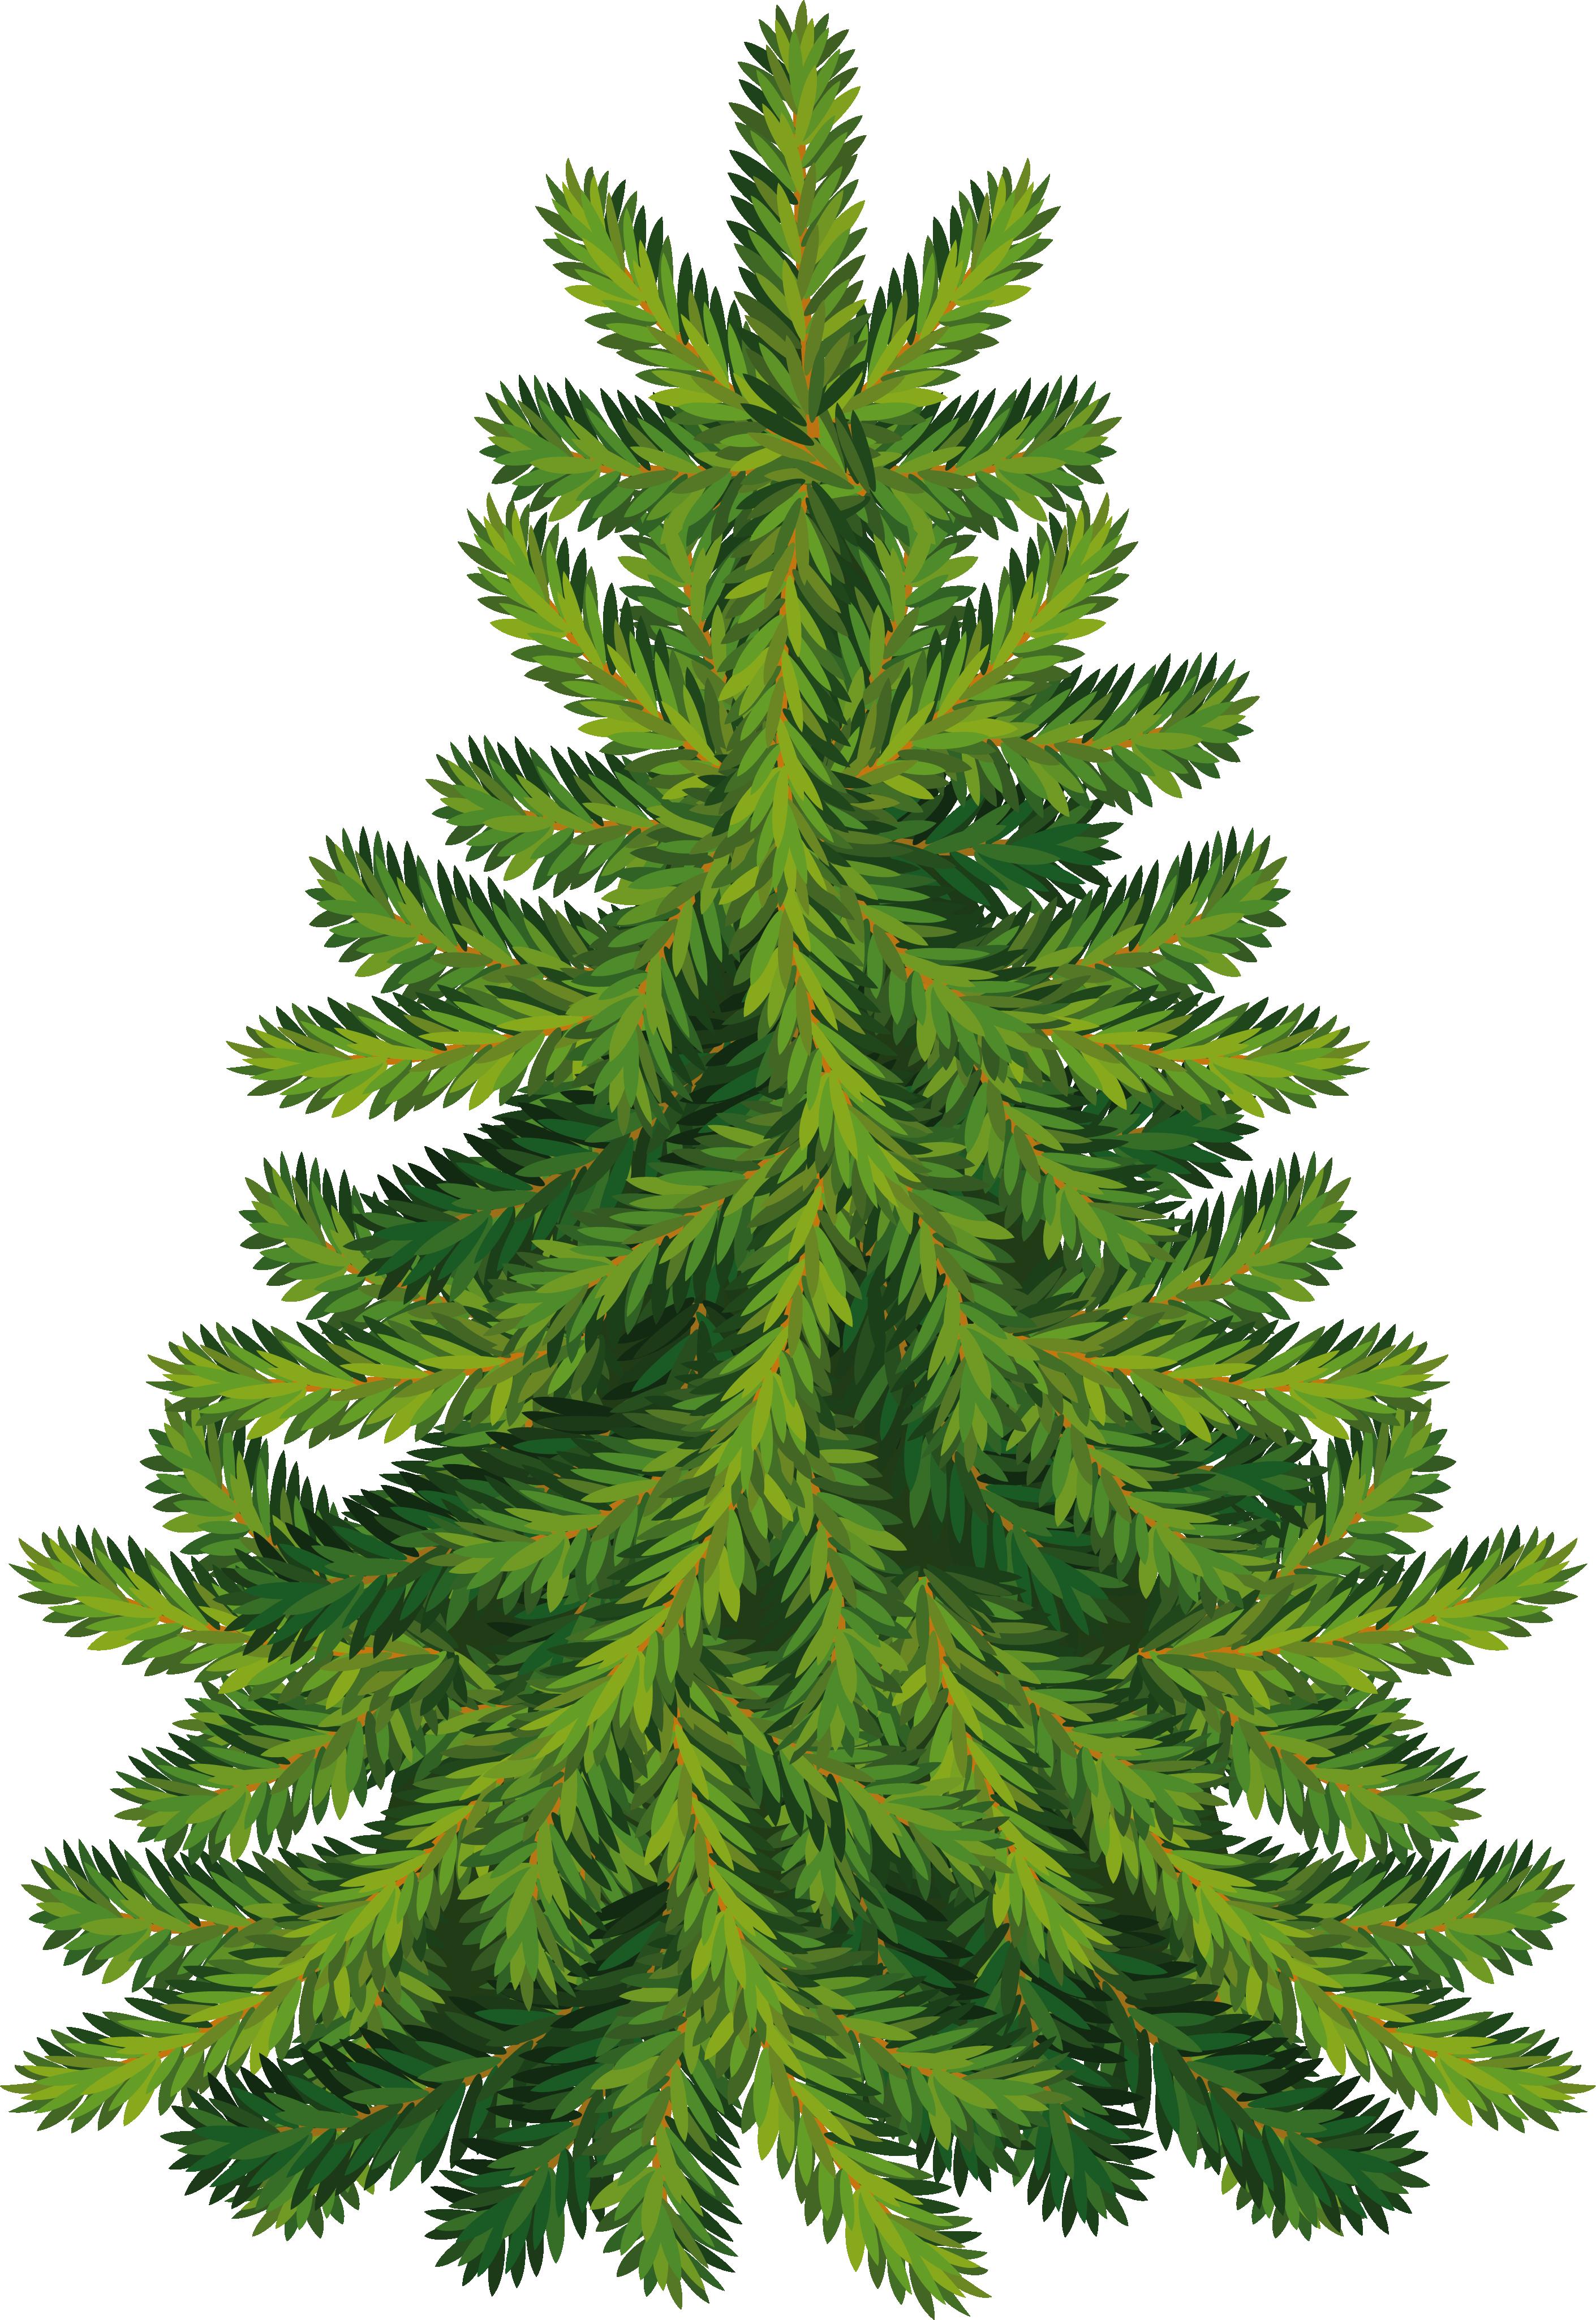 Fir-tree PNG image